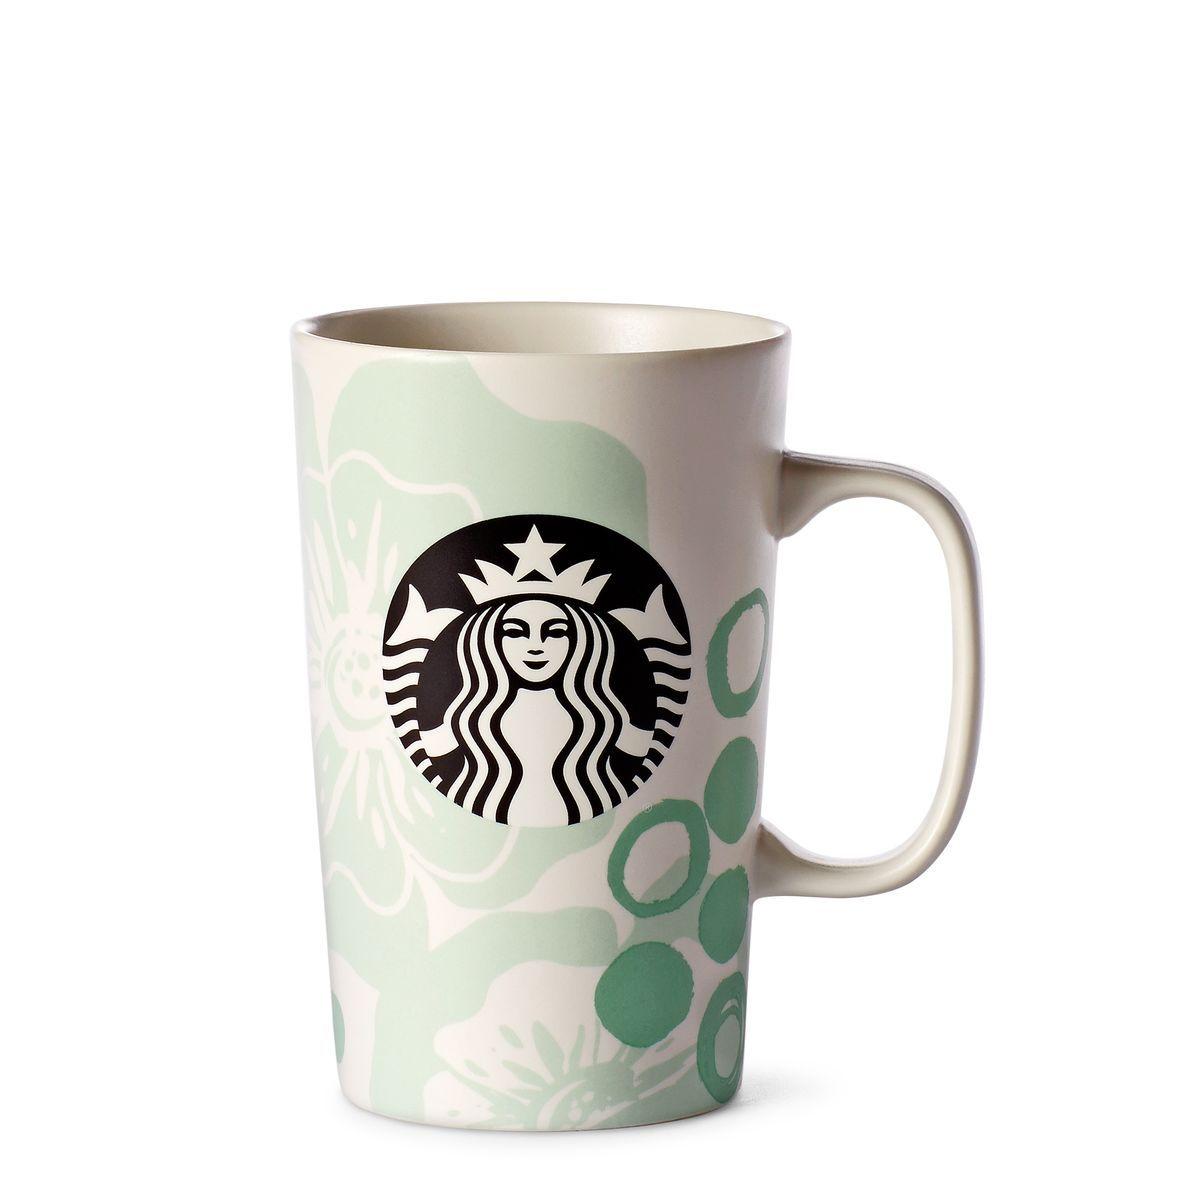 A grande ceramic coffee mug with a tropical flower design in mint ...